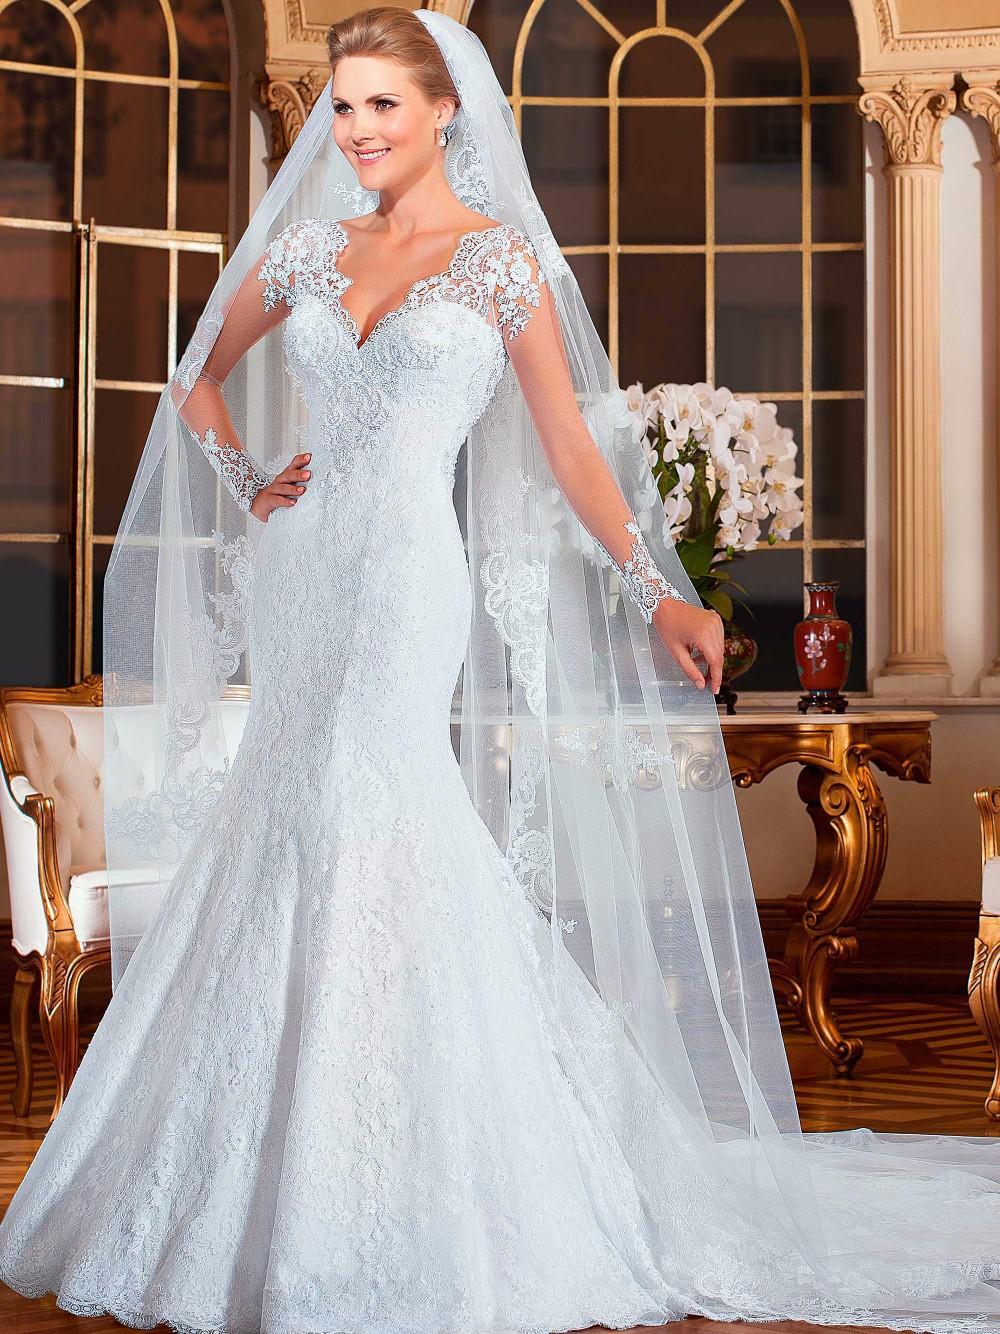 Vestido de noiva sereia Sexy Lace Wedding Dresses See Back Long Sleeve Mermaid 2015 robe mariage - Shining Girl store